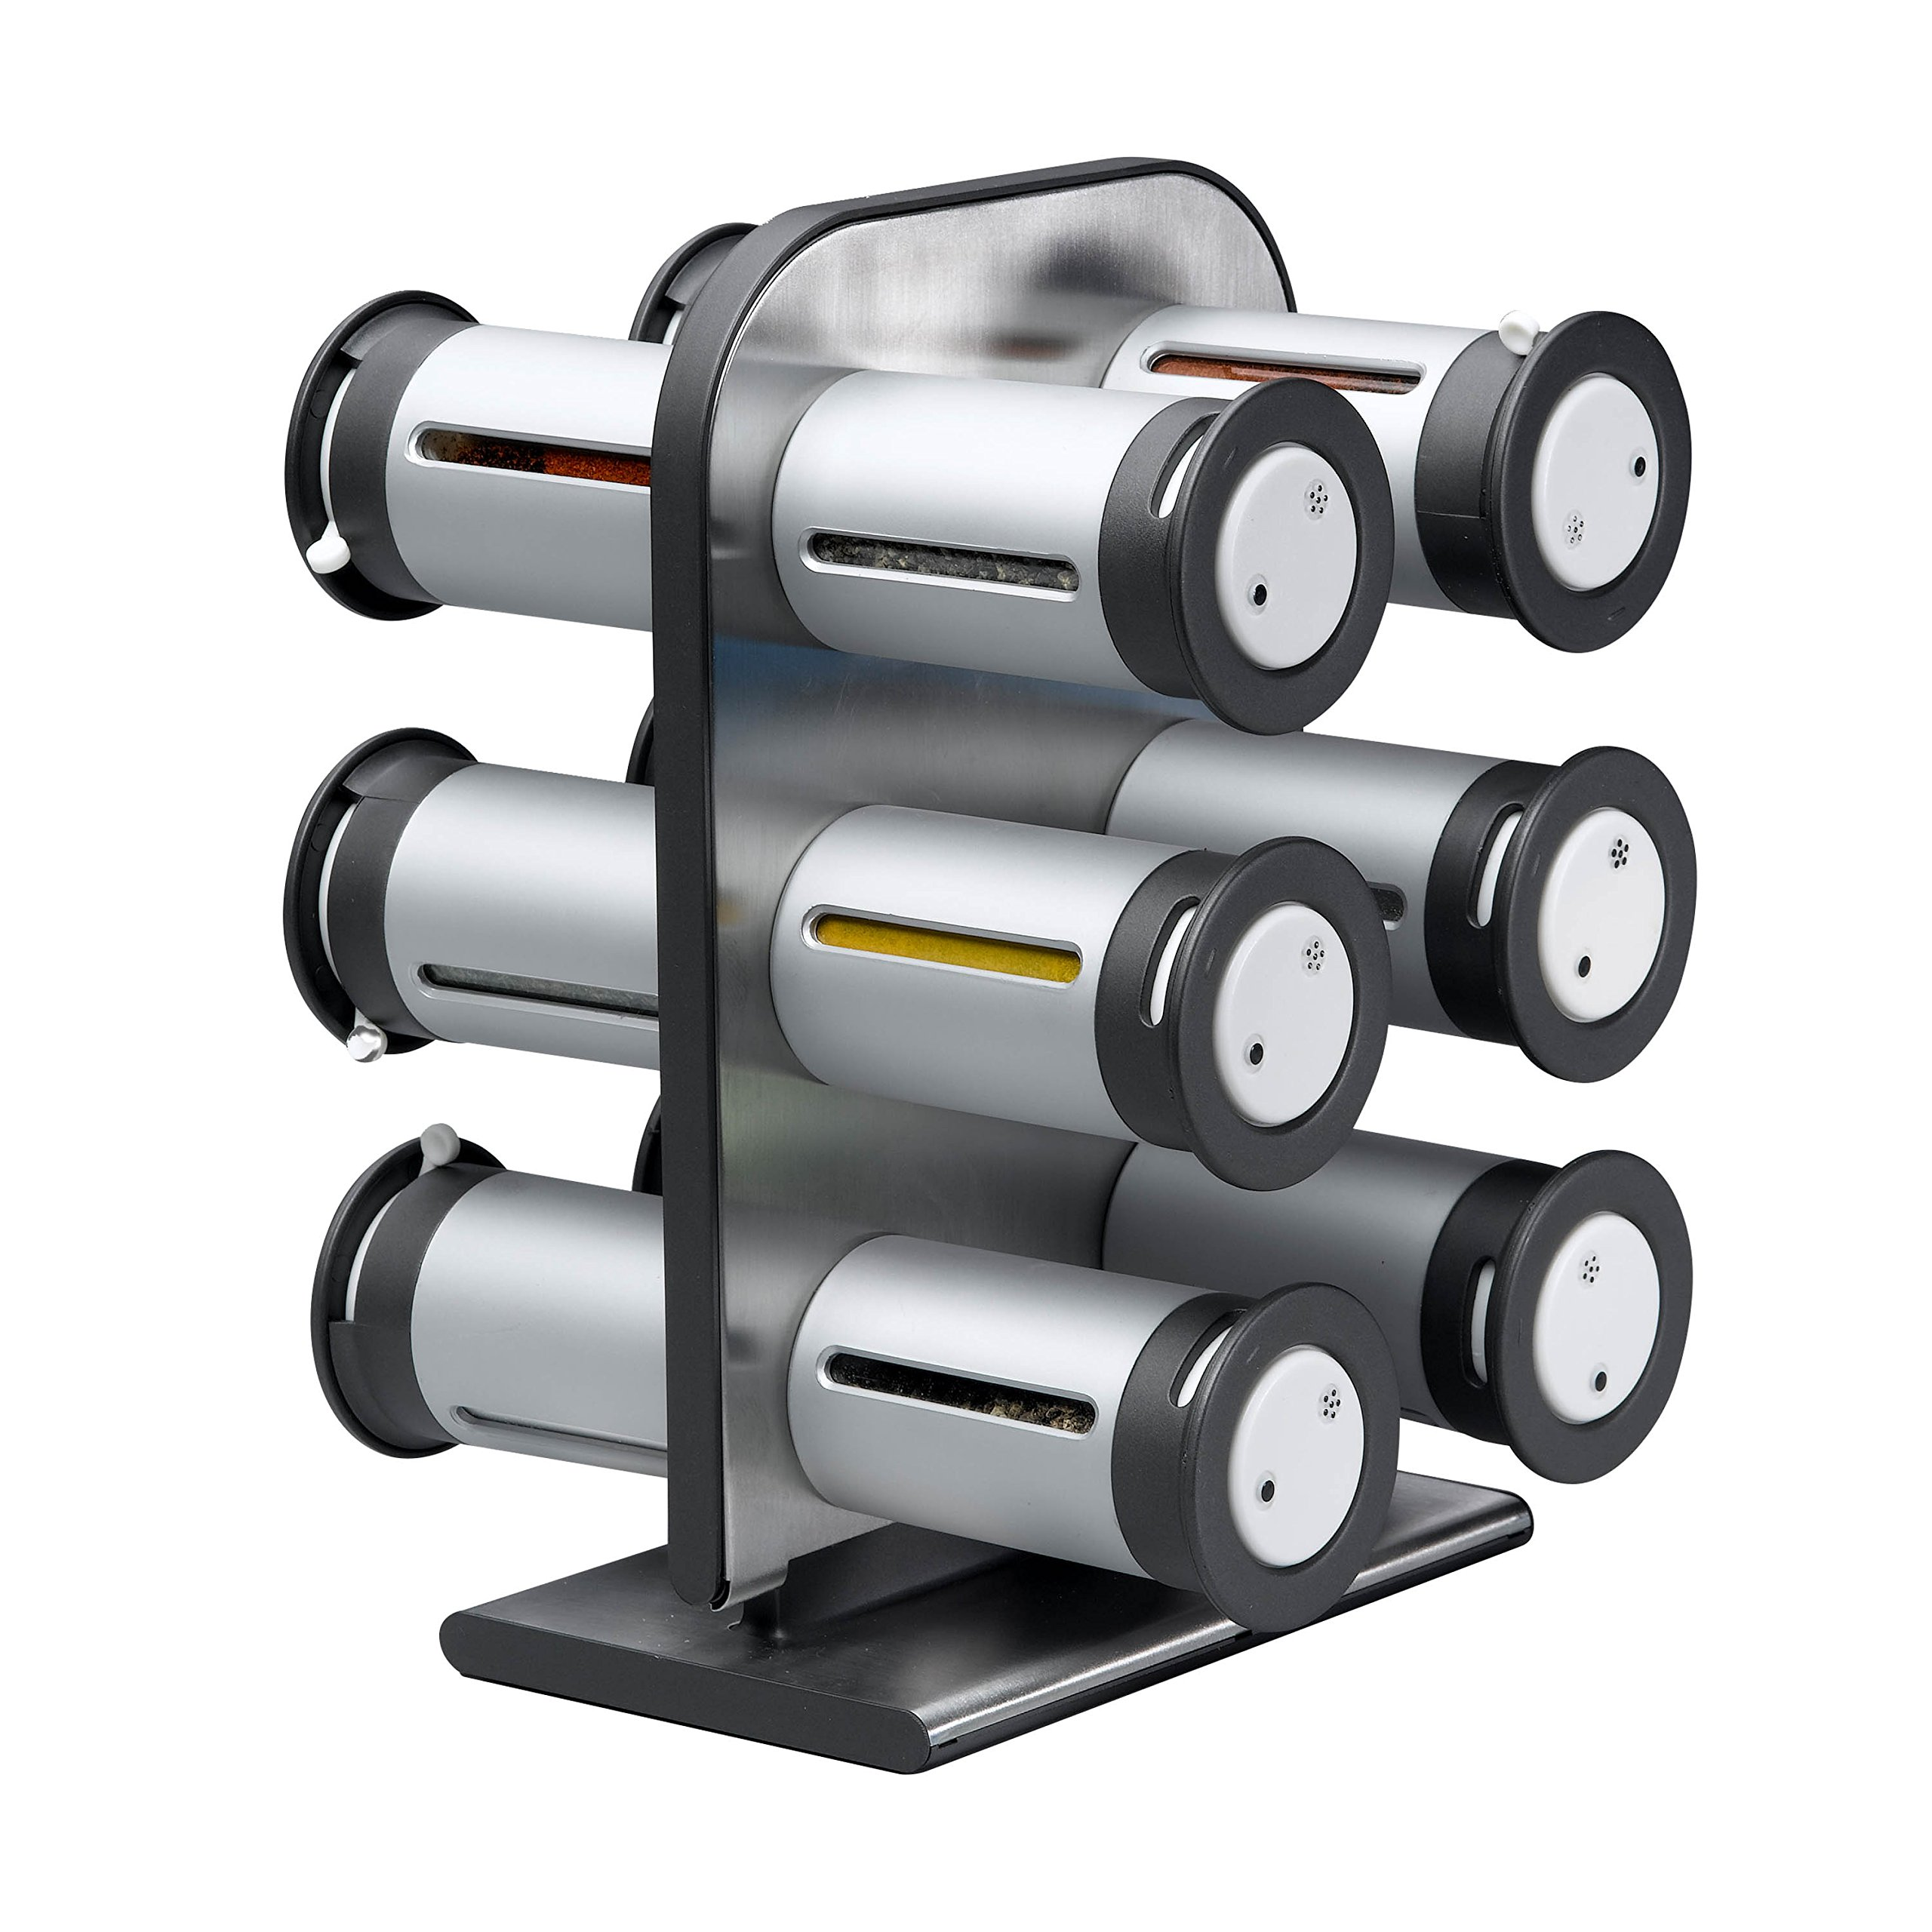 Zevro KCH-06098 Zero Gravity Countertop Magnetic Spice Rack with Canisters, Metallic/Grey - Set of 12